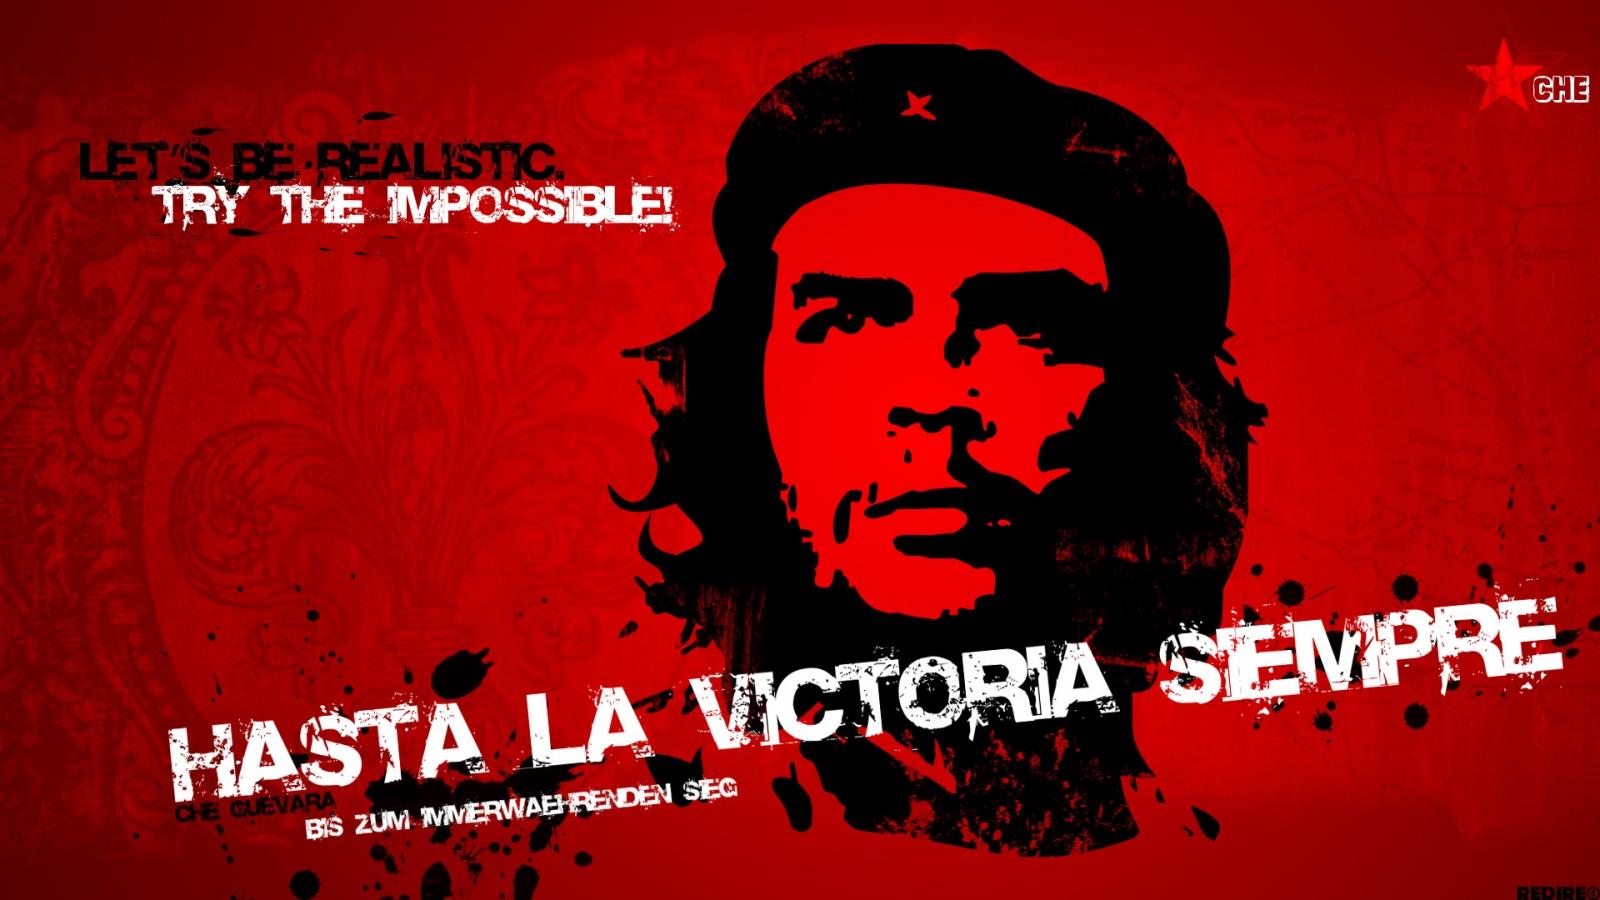 Интернет на Кубе. От революции к революции - 1